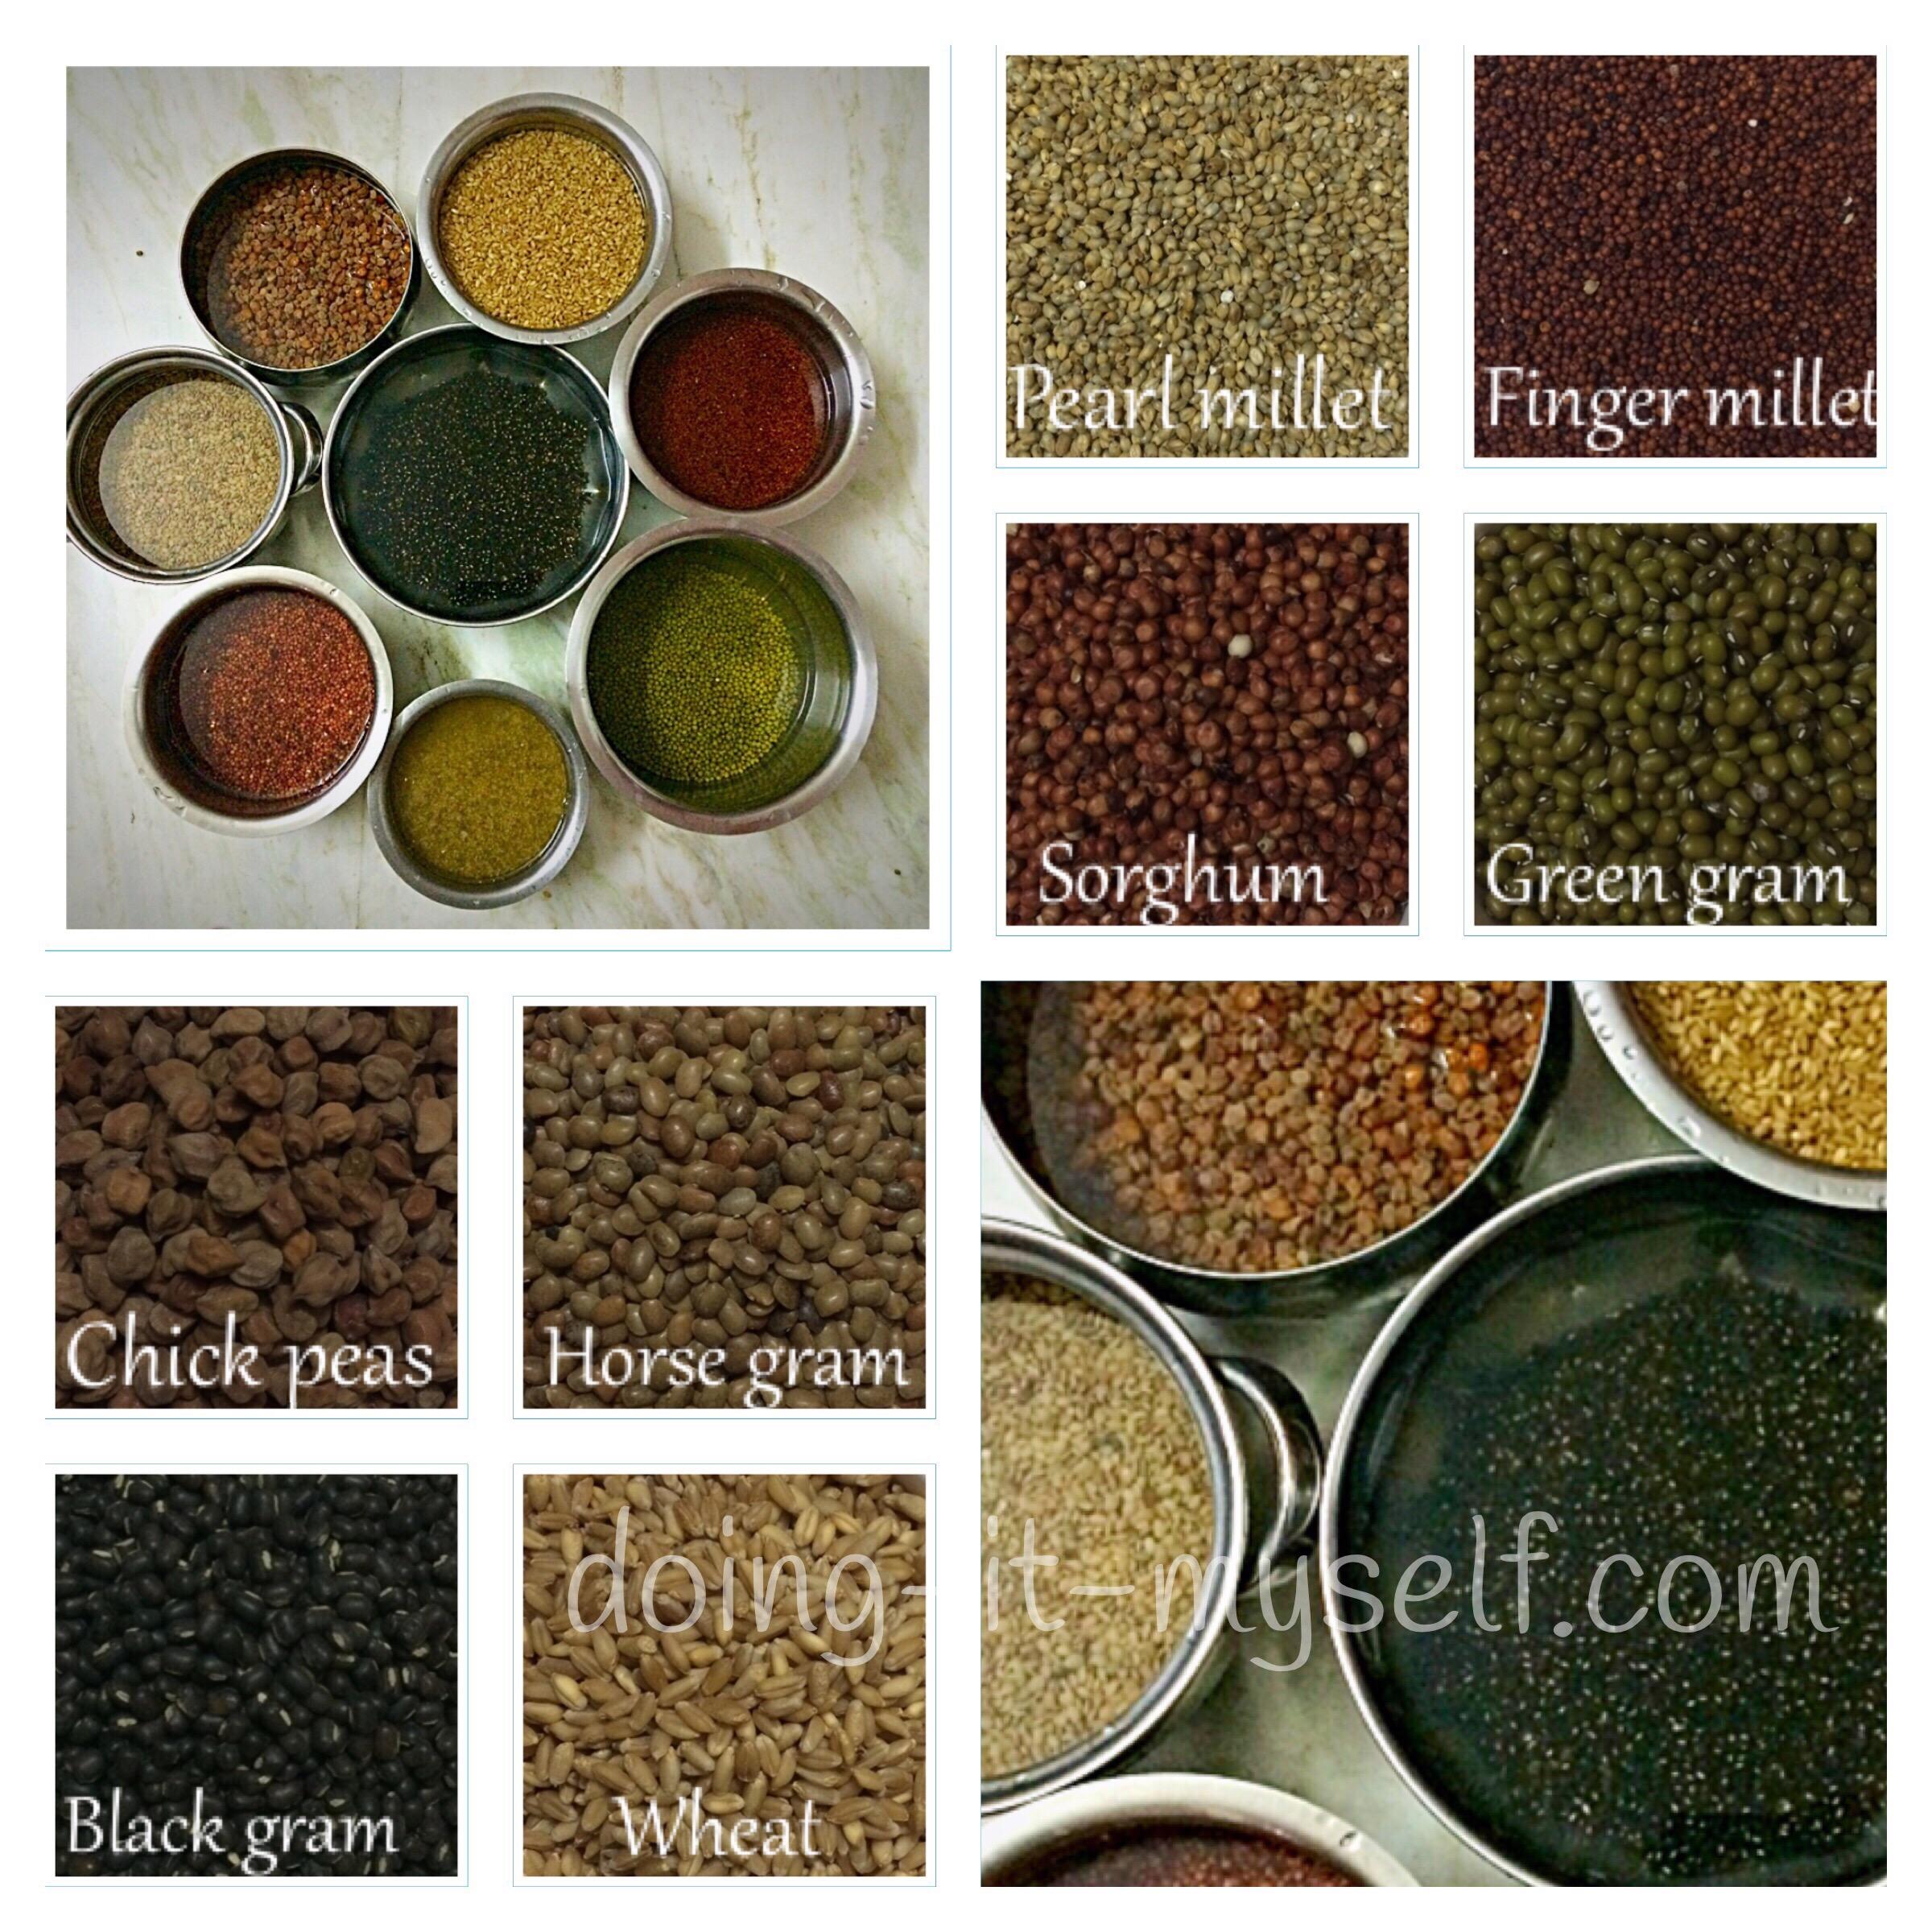 soaking-millets-redrice-pulses